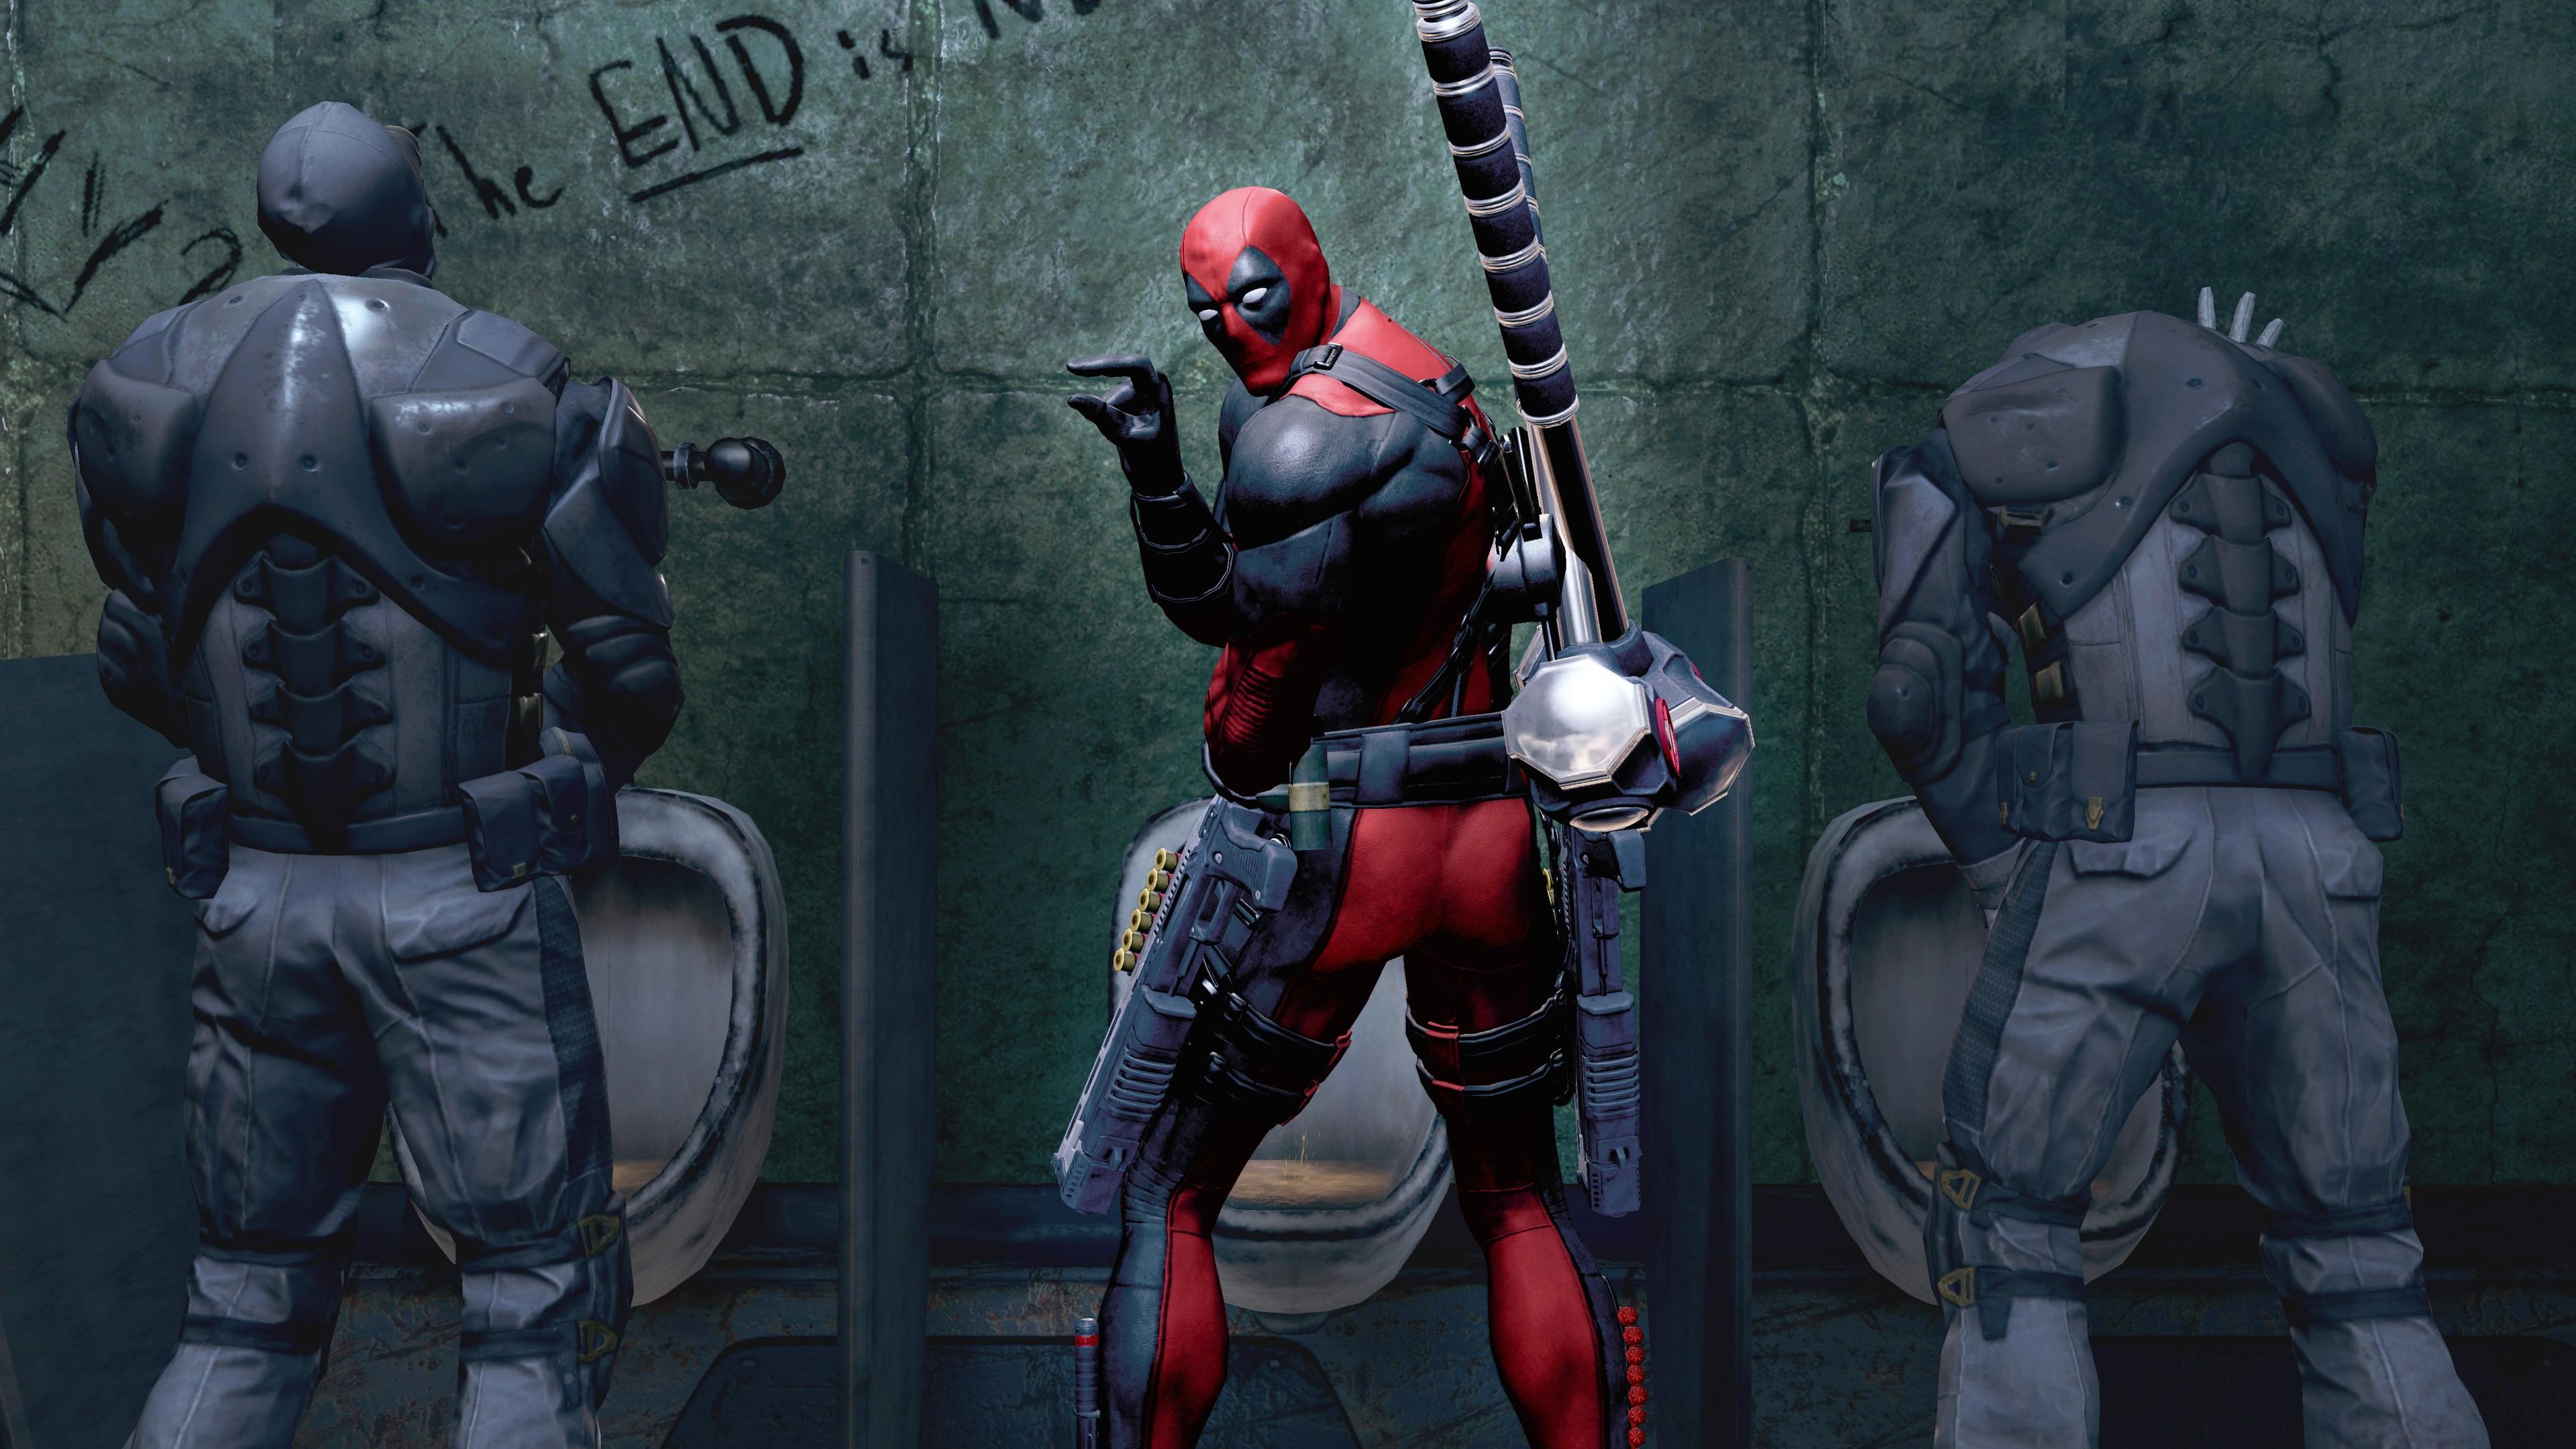 deadpool lol 1536363743 - Deadpool LoL - super heroes wallpapers, movies wallpapers, funny wallpapers, deadpool wallpapers